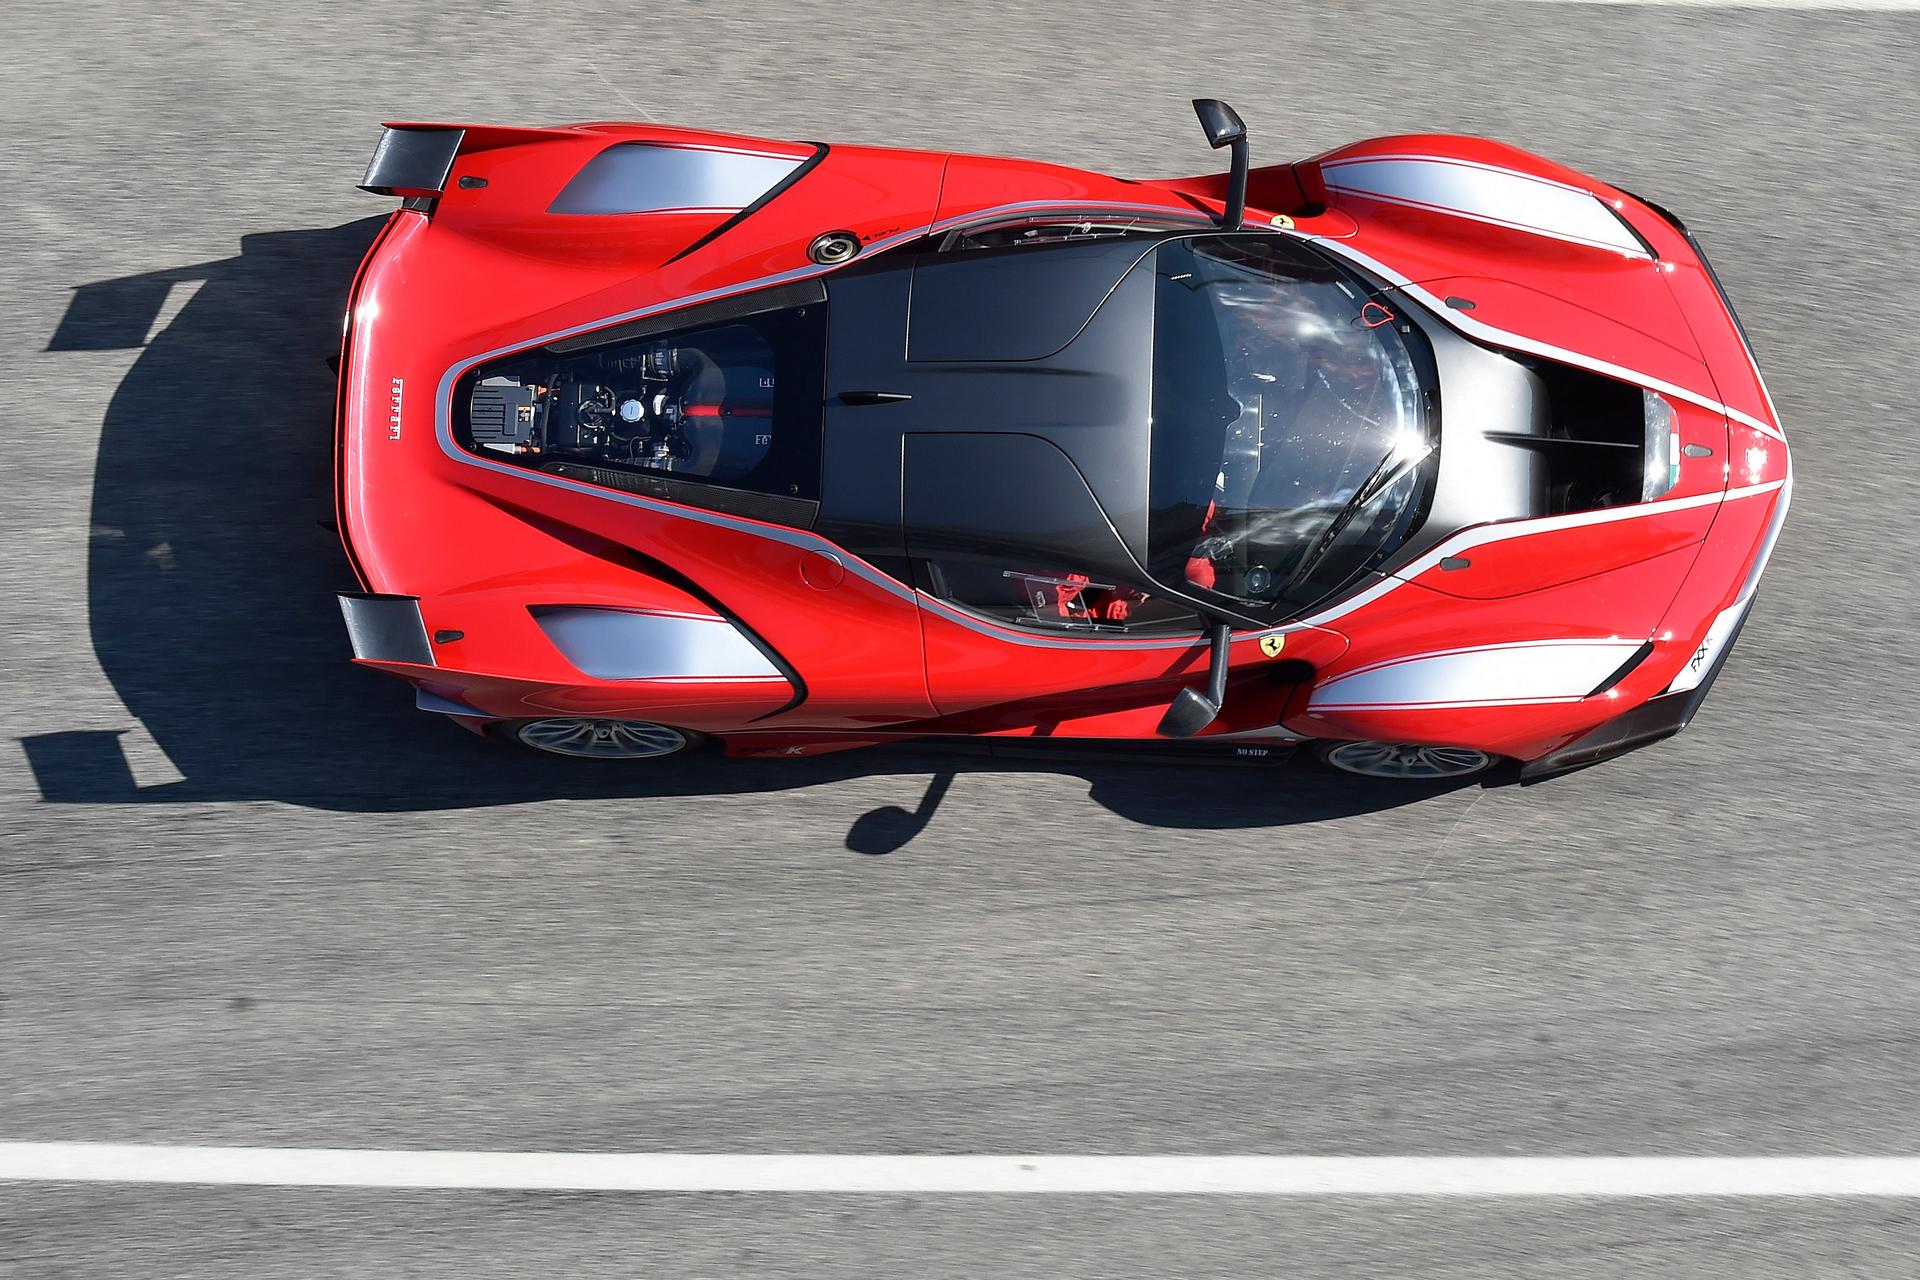 Ferrari FXX K © Fiat Chrysler Automobiles N.V.